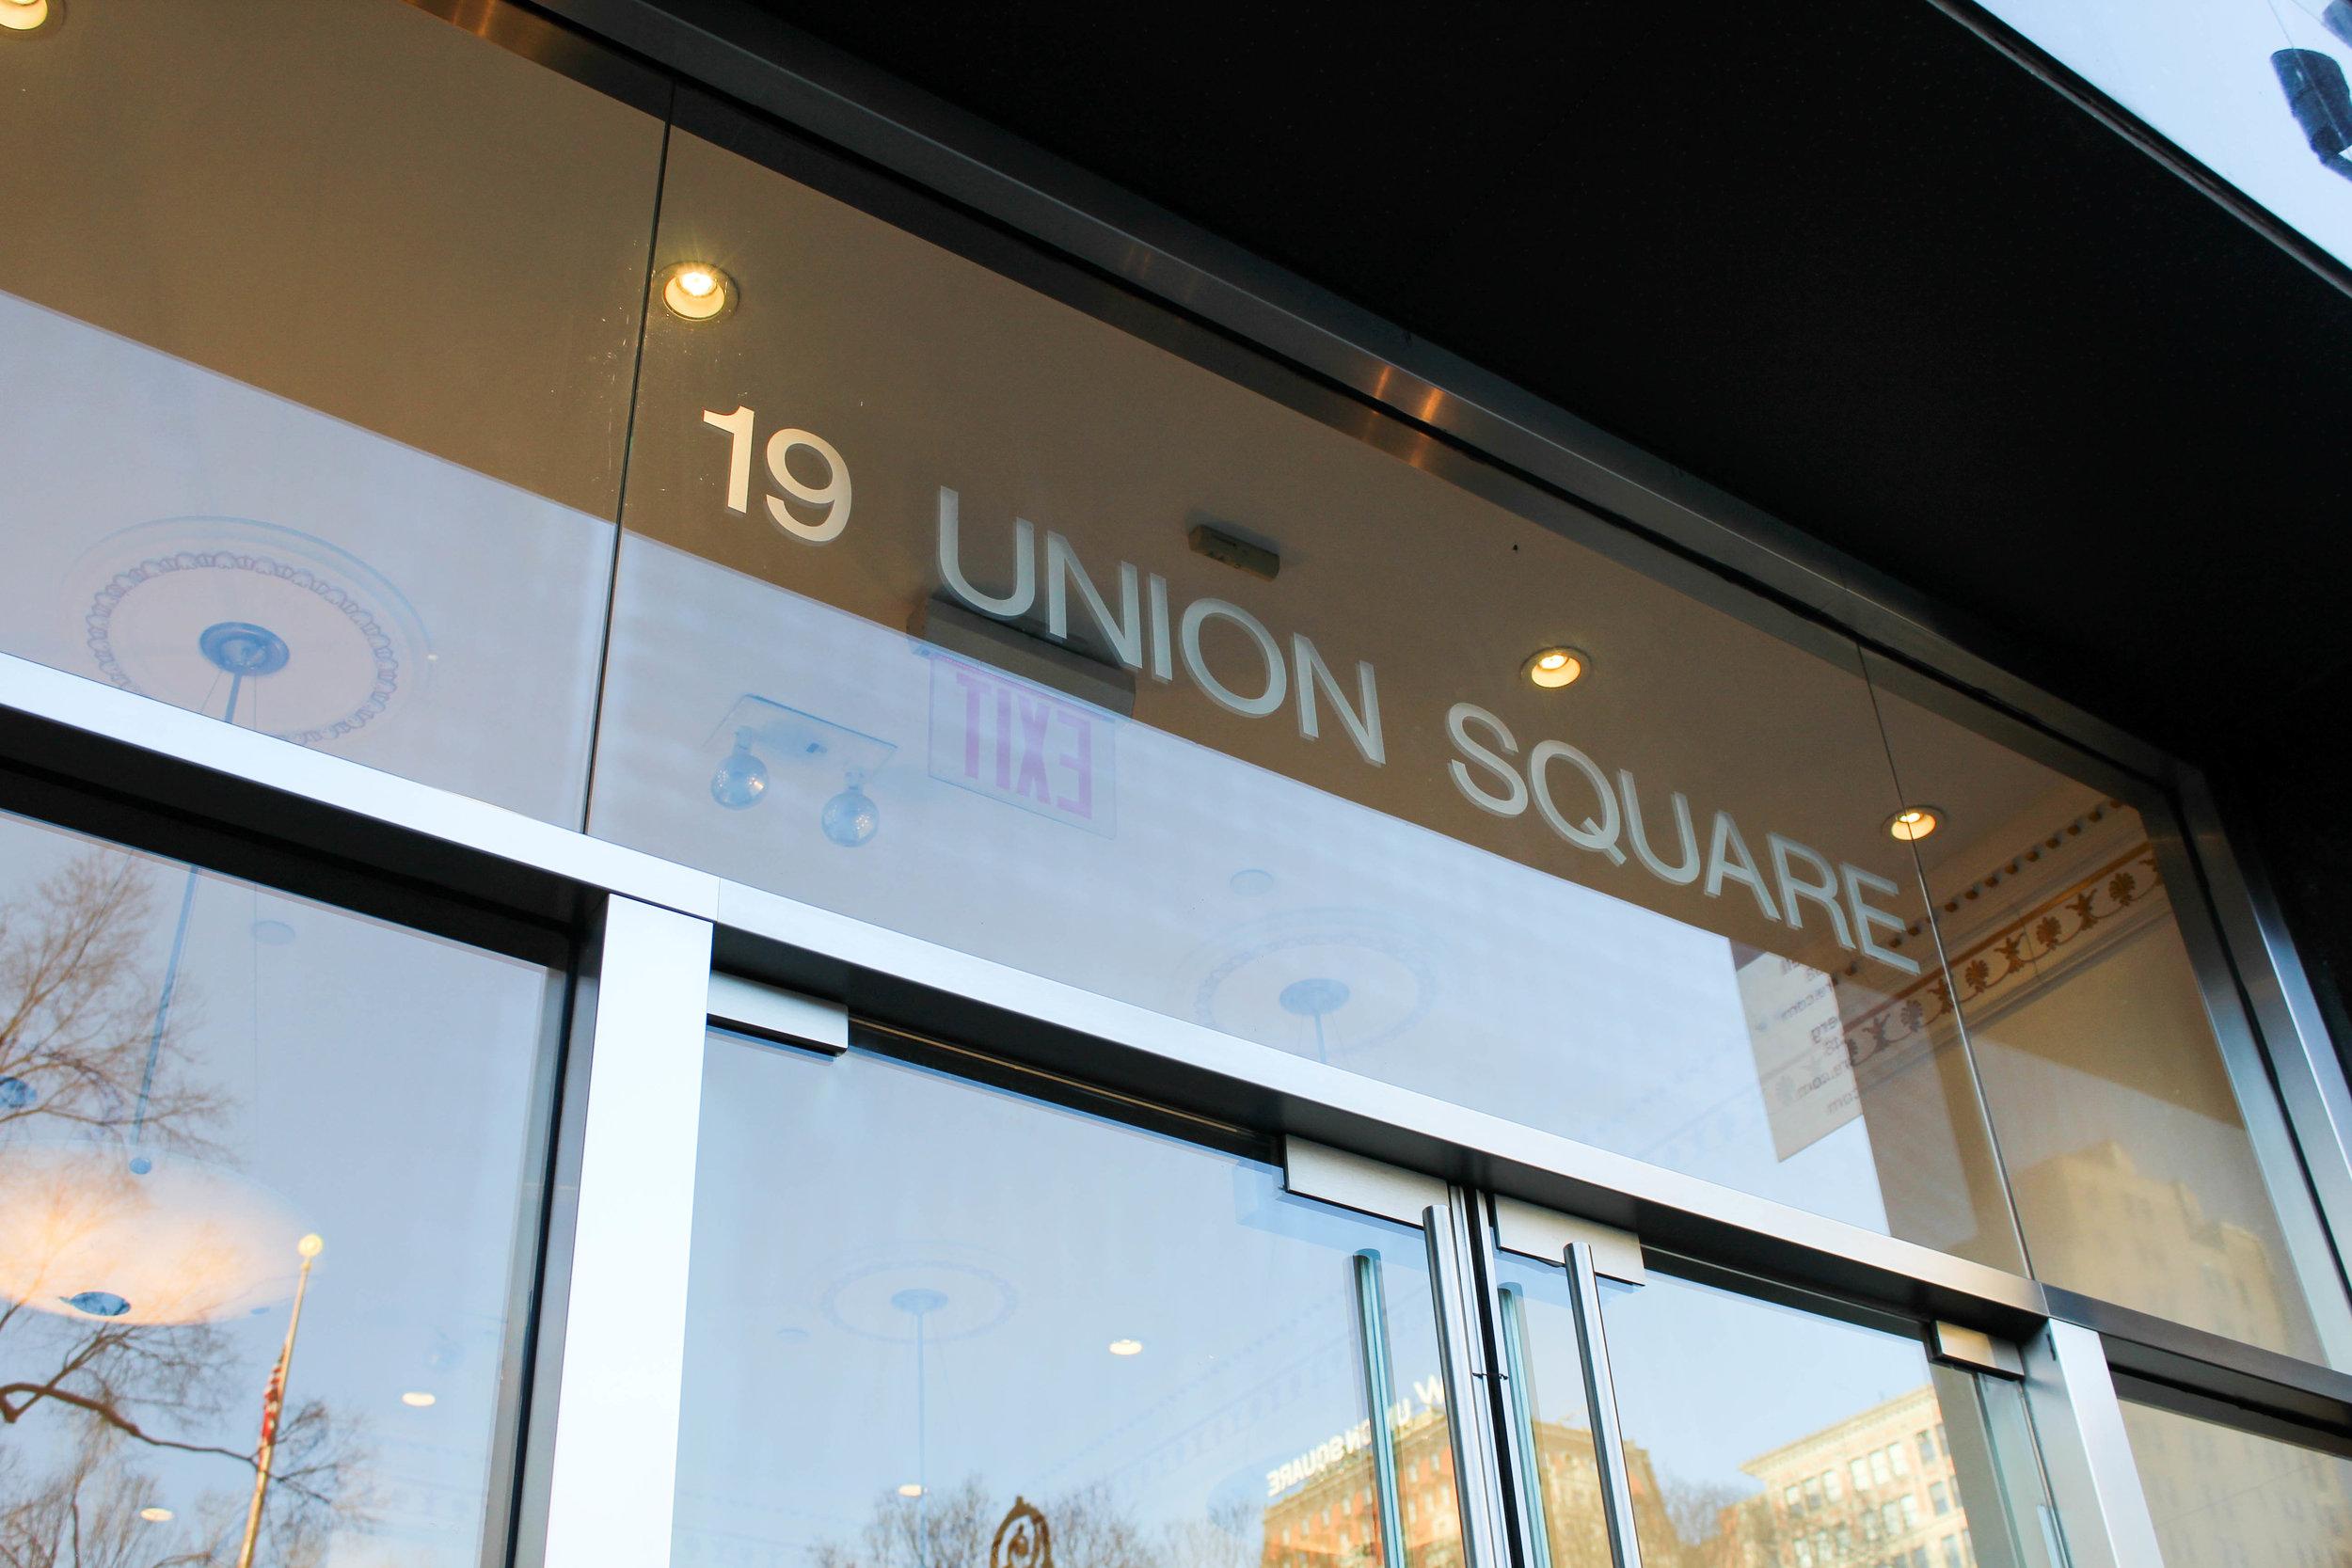 19 union square.jpg